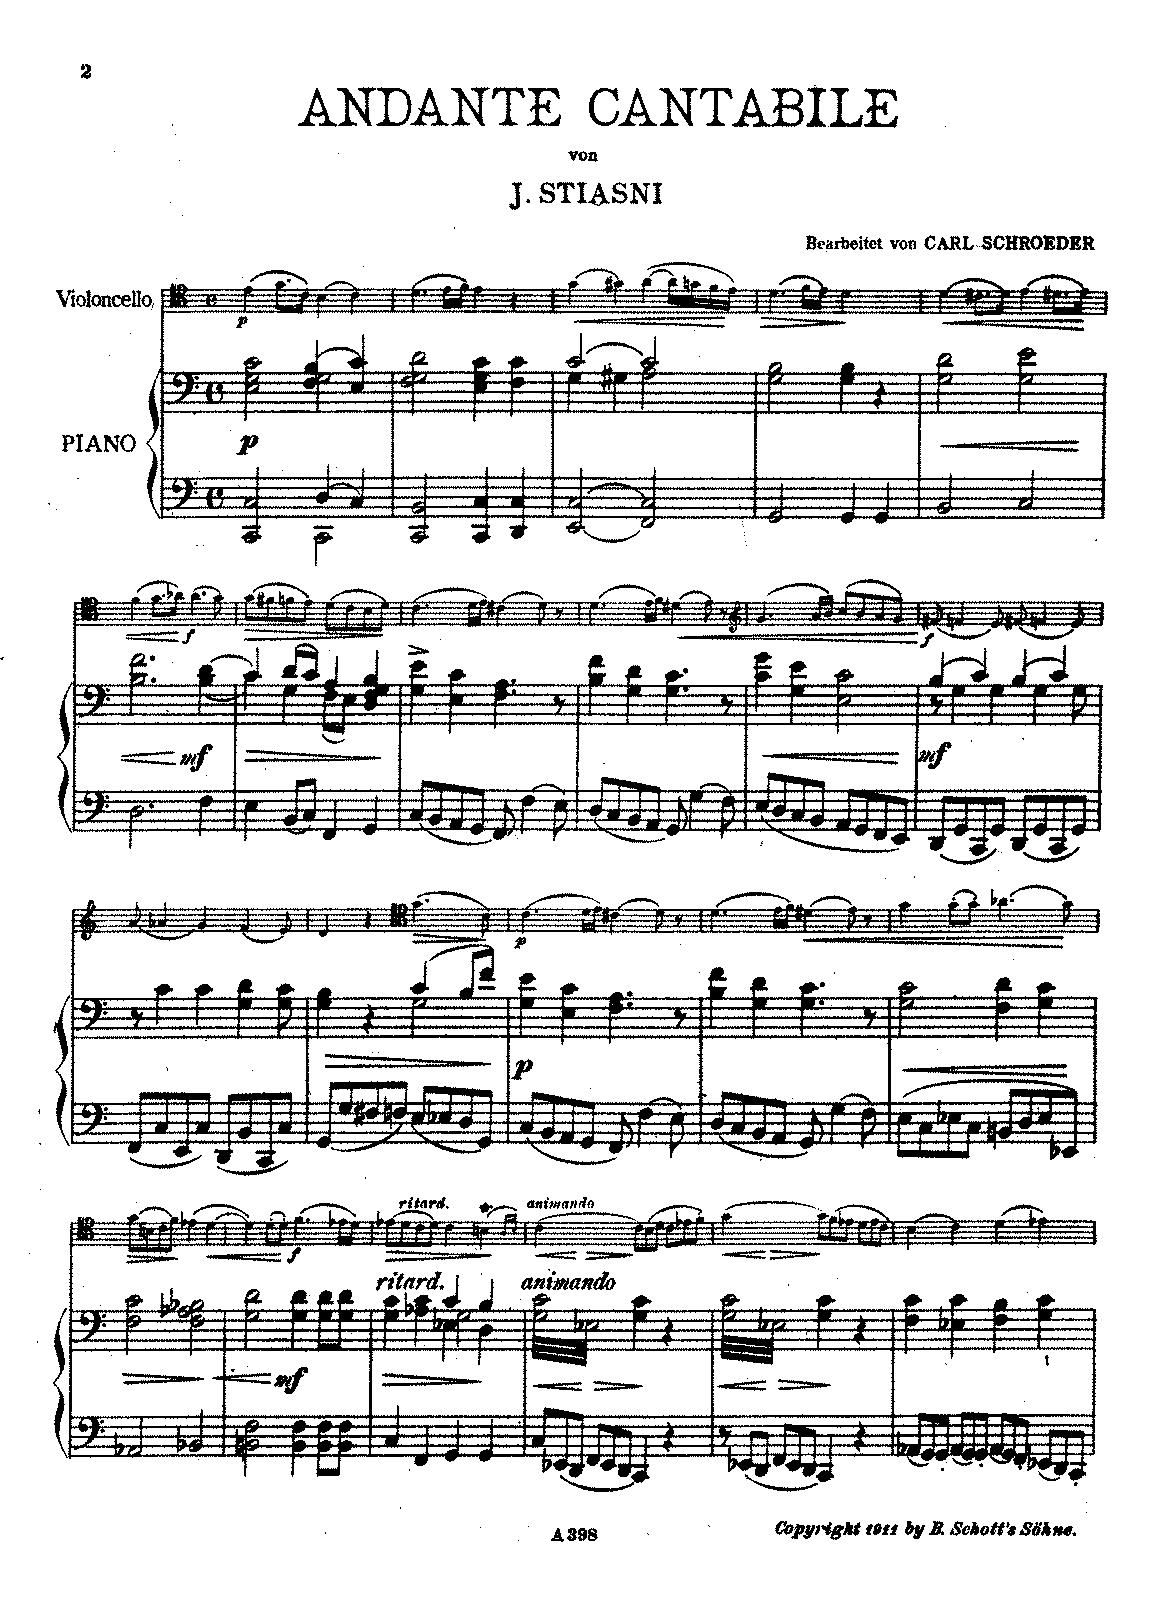 free classical sheet music public domain